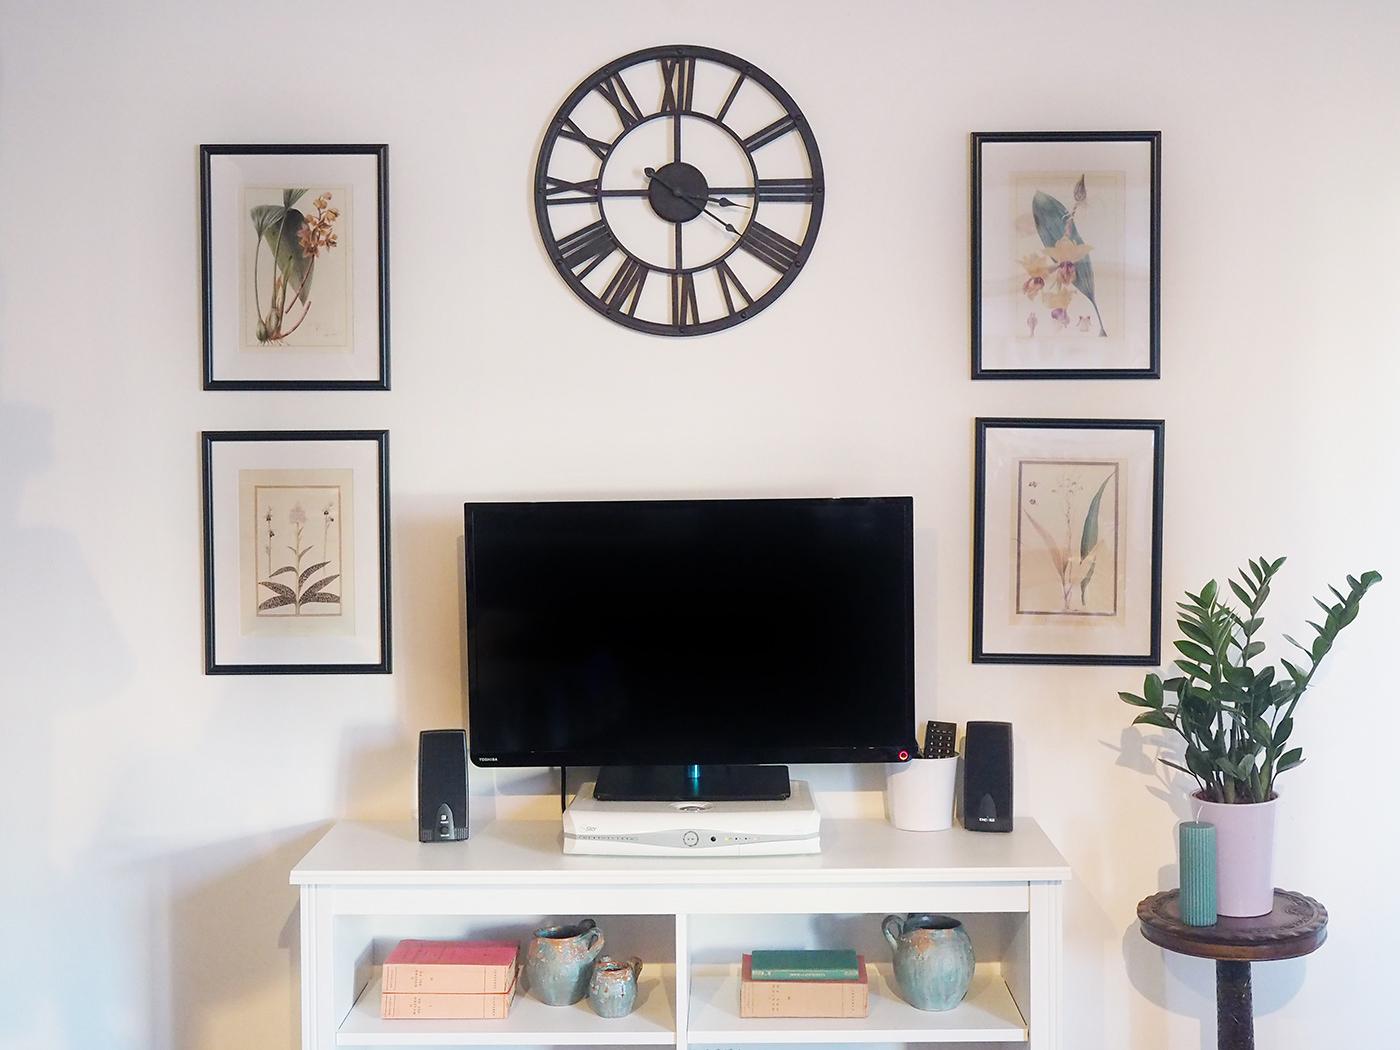 Cozy San Basilio With Garden View Tv